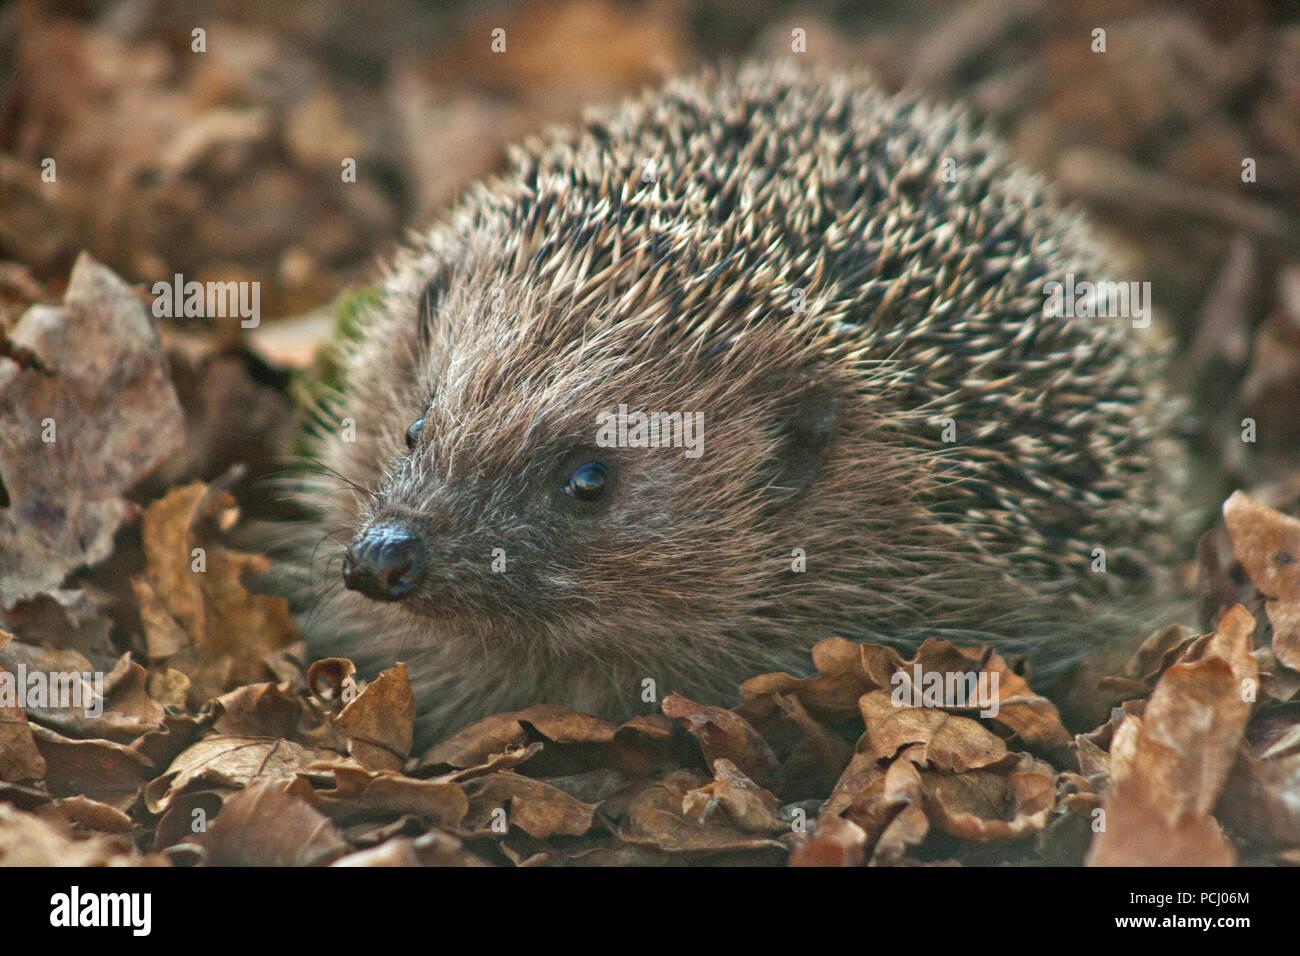 British Hedgehog - Stock Image